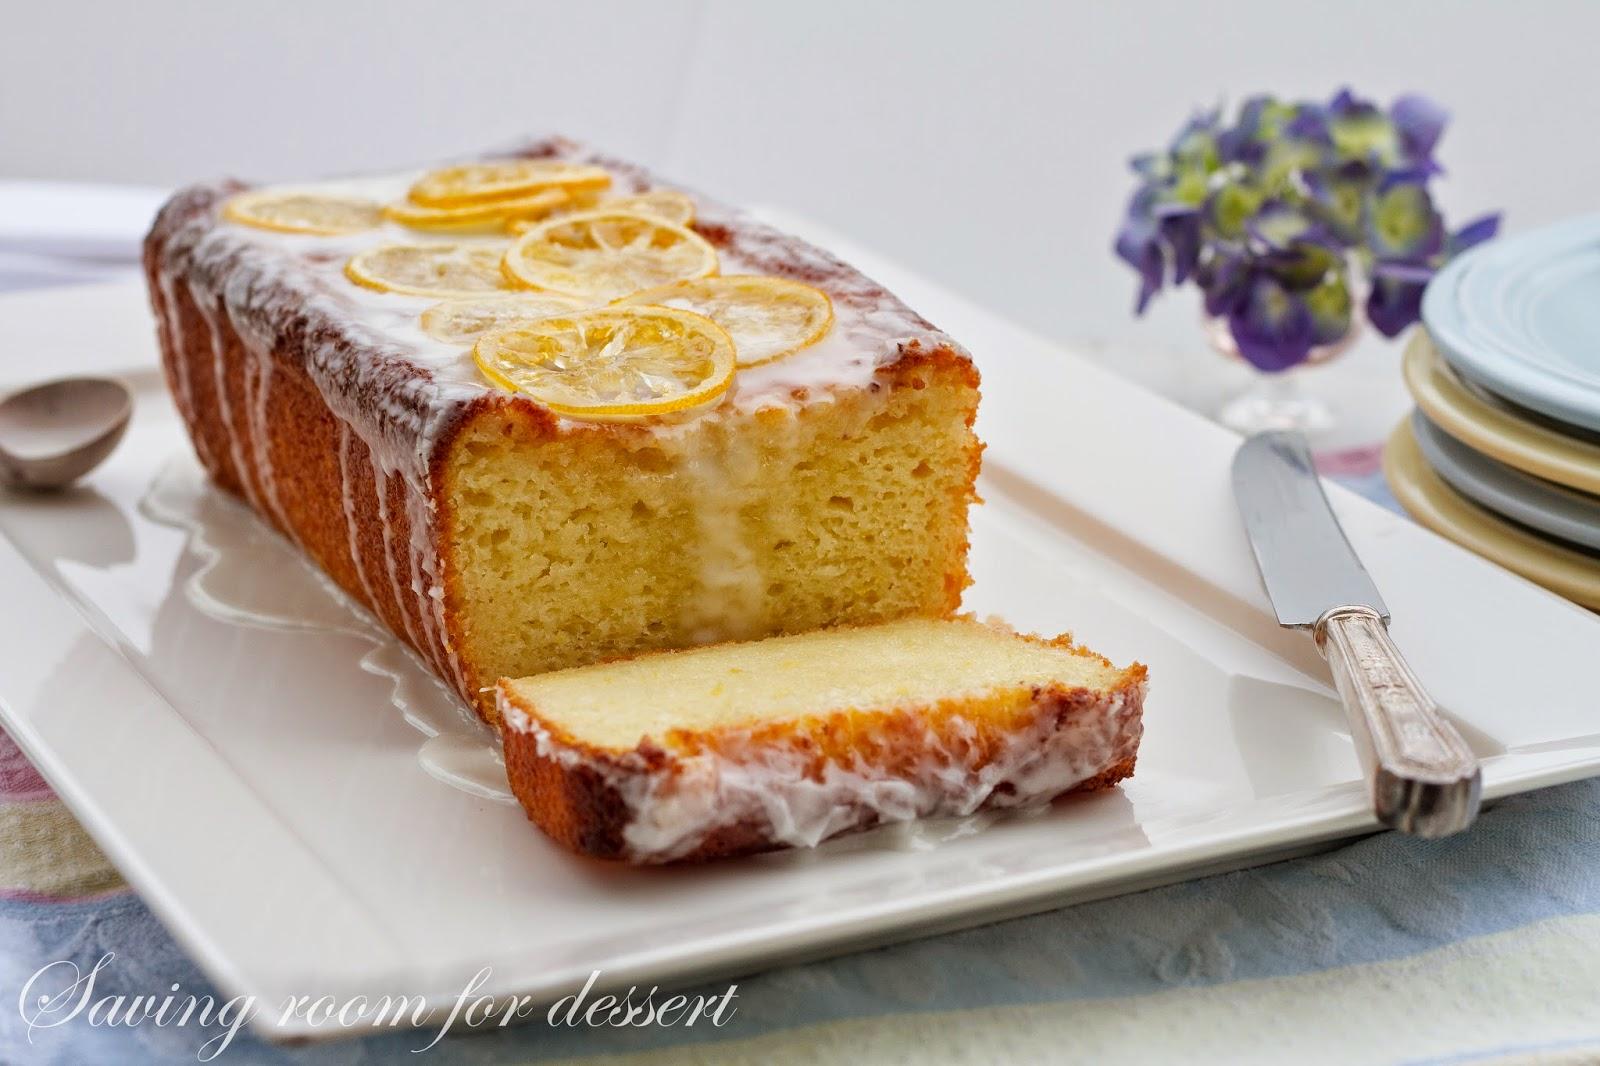 Lemon Yogurt Cake - Saving Room for Dessert